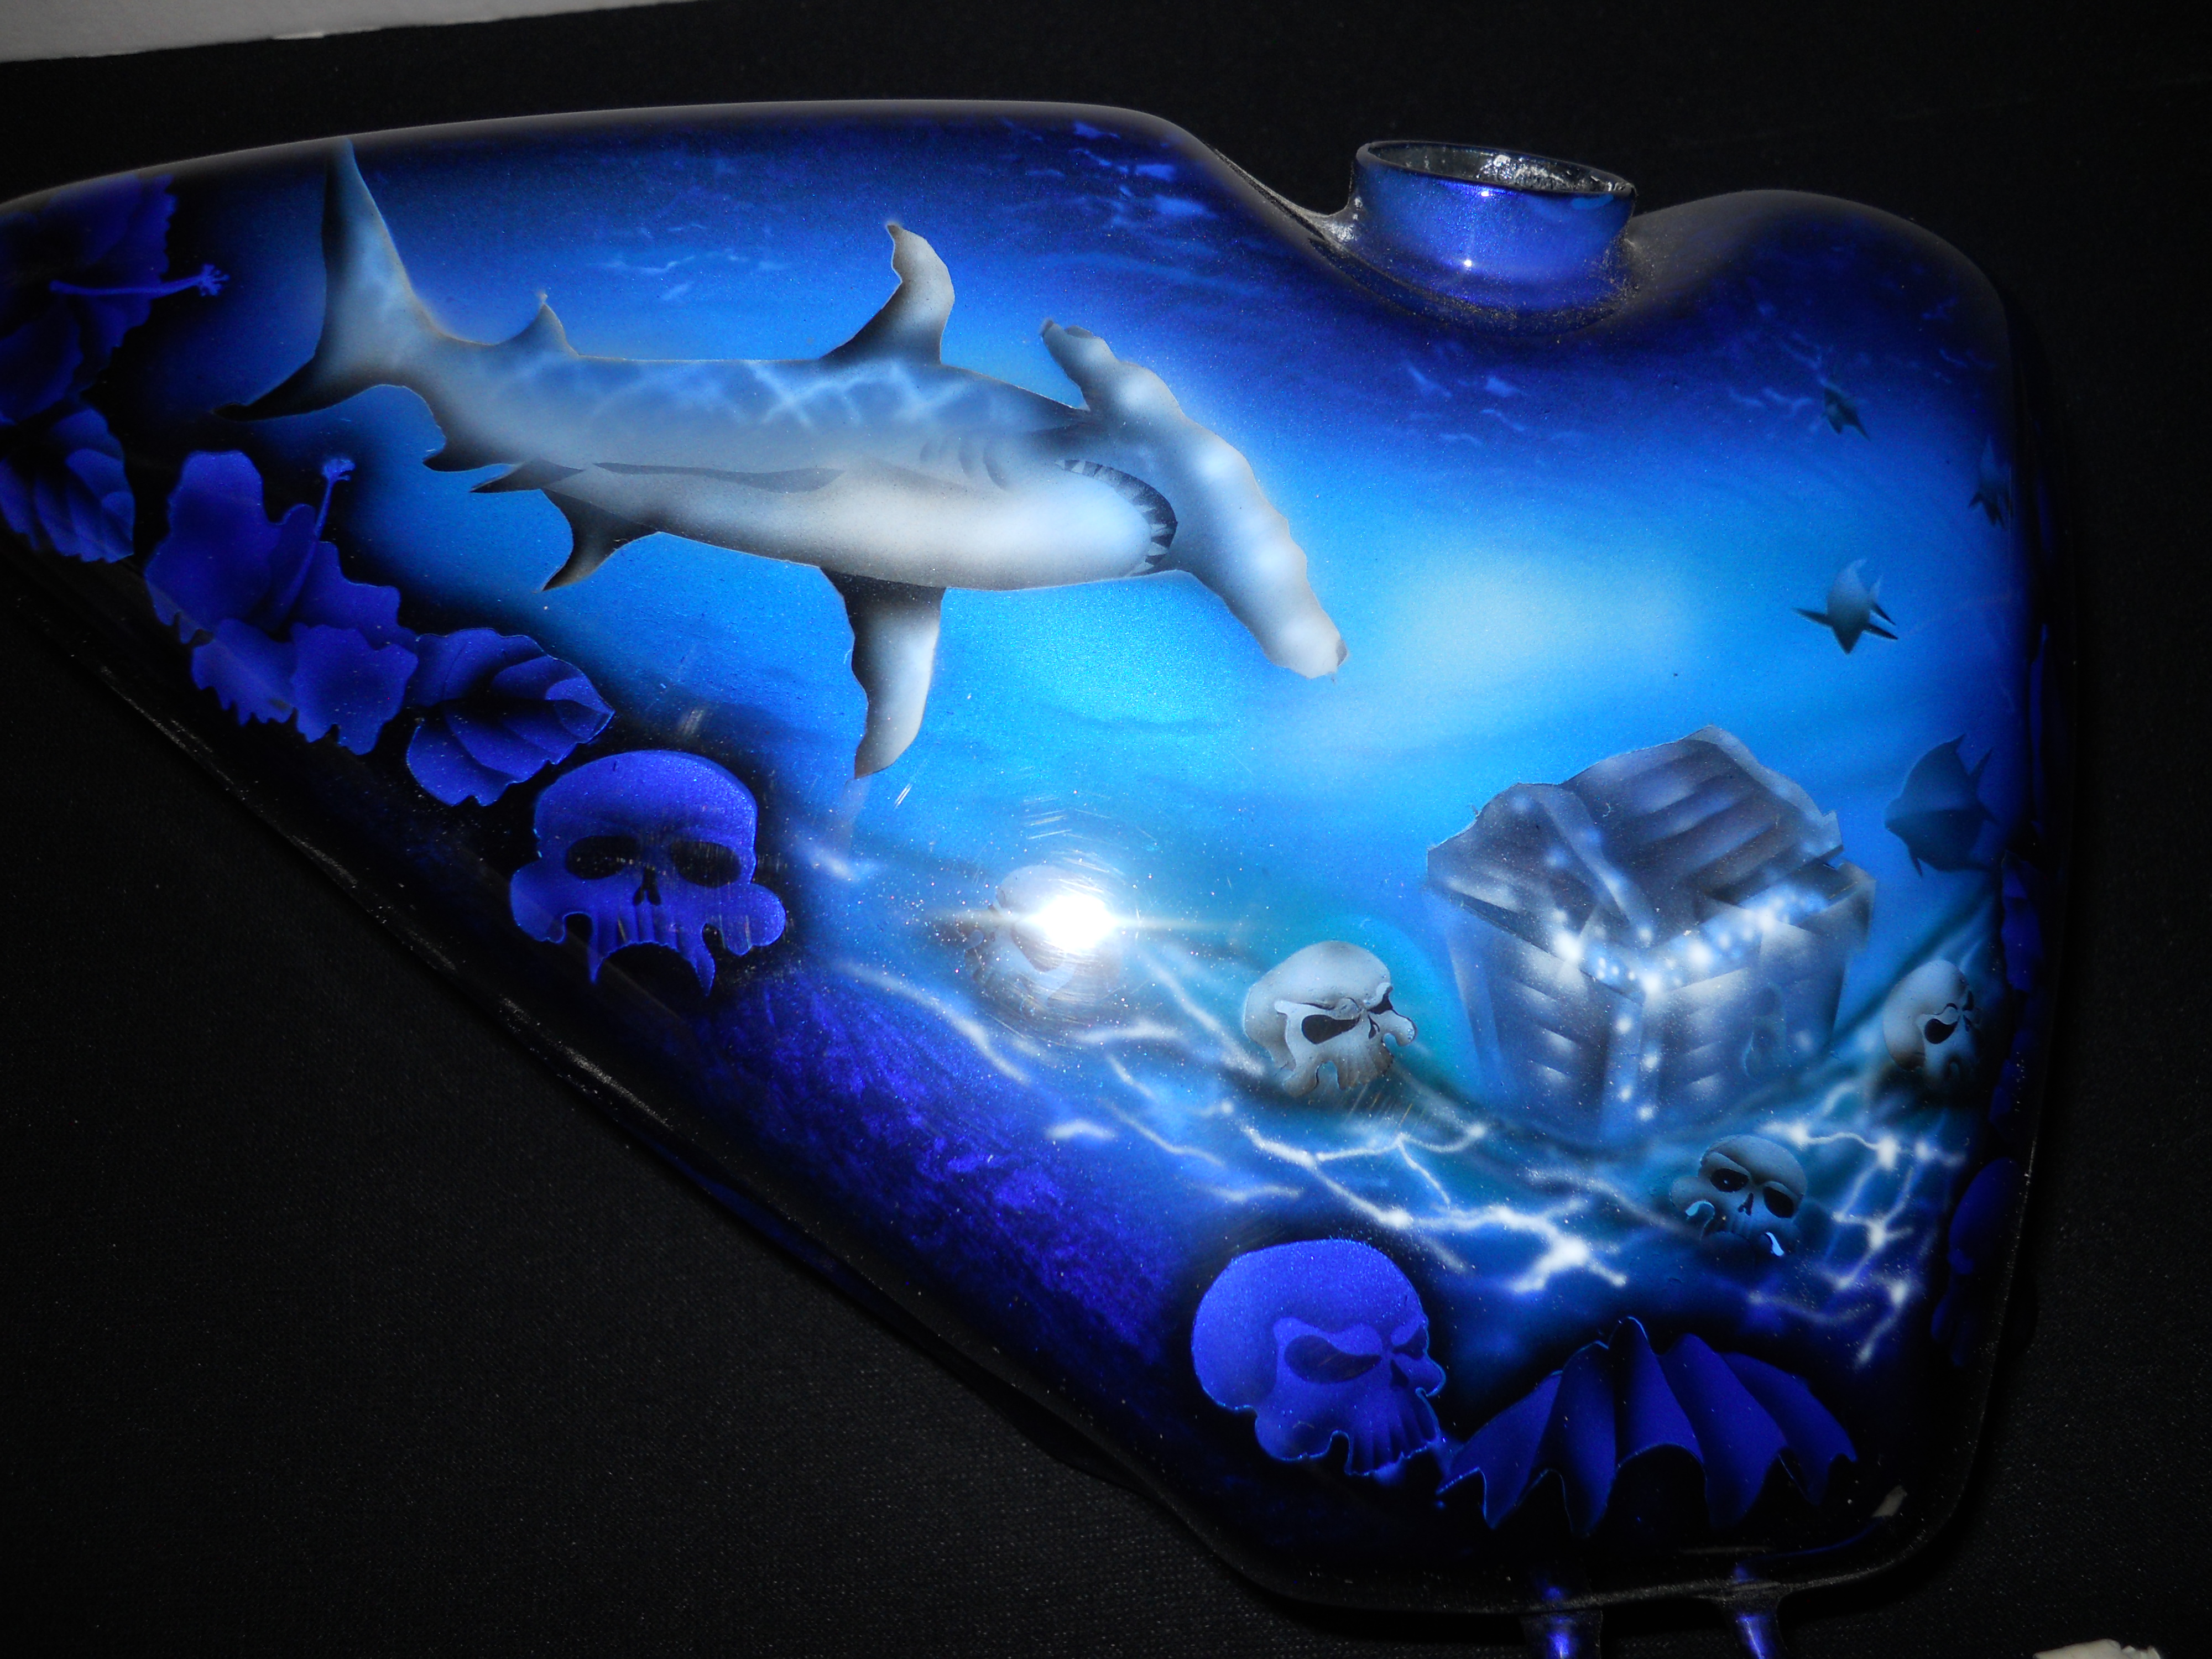 Harley-Davidson-Blue-Candy-Hammerheadshark-shark-underwater-Gas-tank-gastank